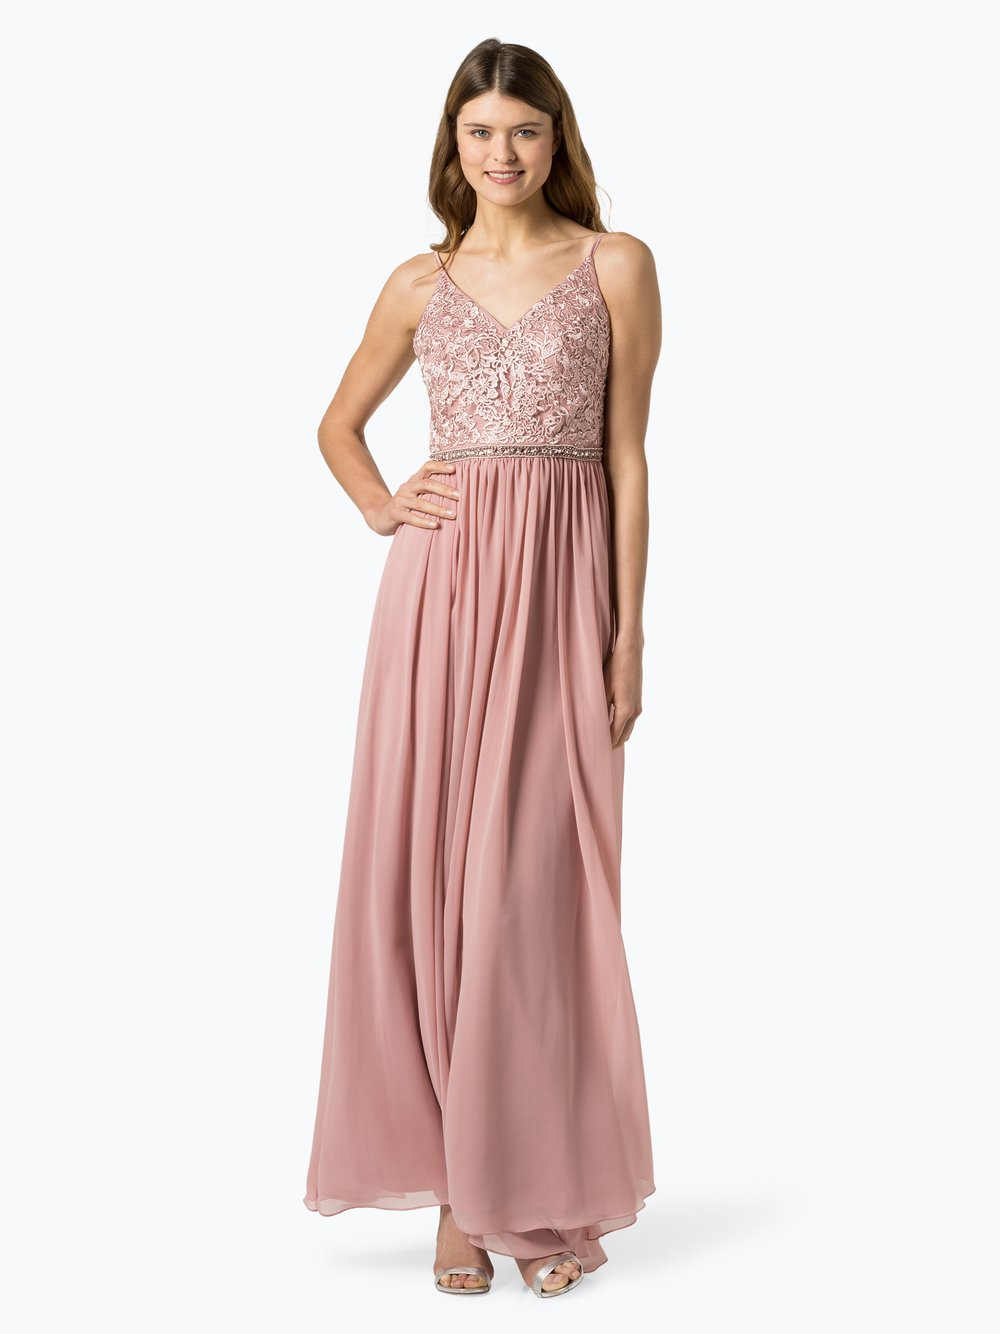 Laona – Damska sukienka wieczorowa, różowy Van Graaf 437549-0001-00340